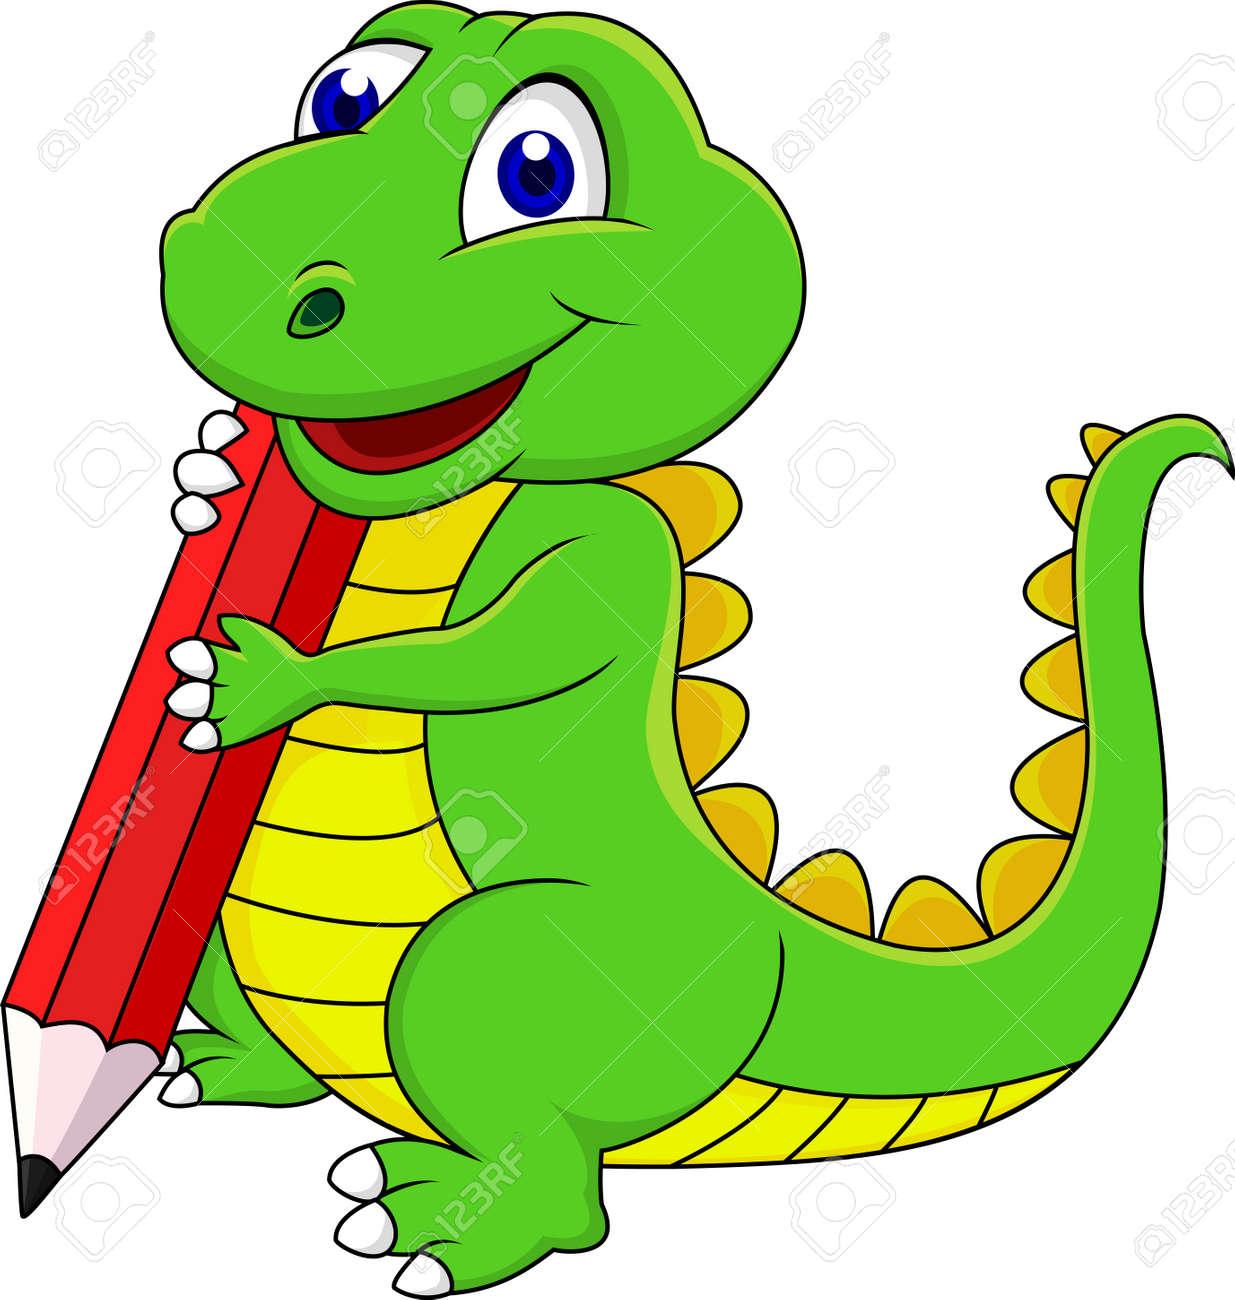 Happy dinosaur cartoon writing with pencil - 15234327